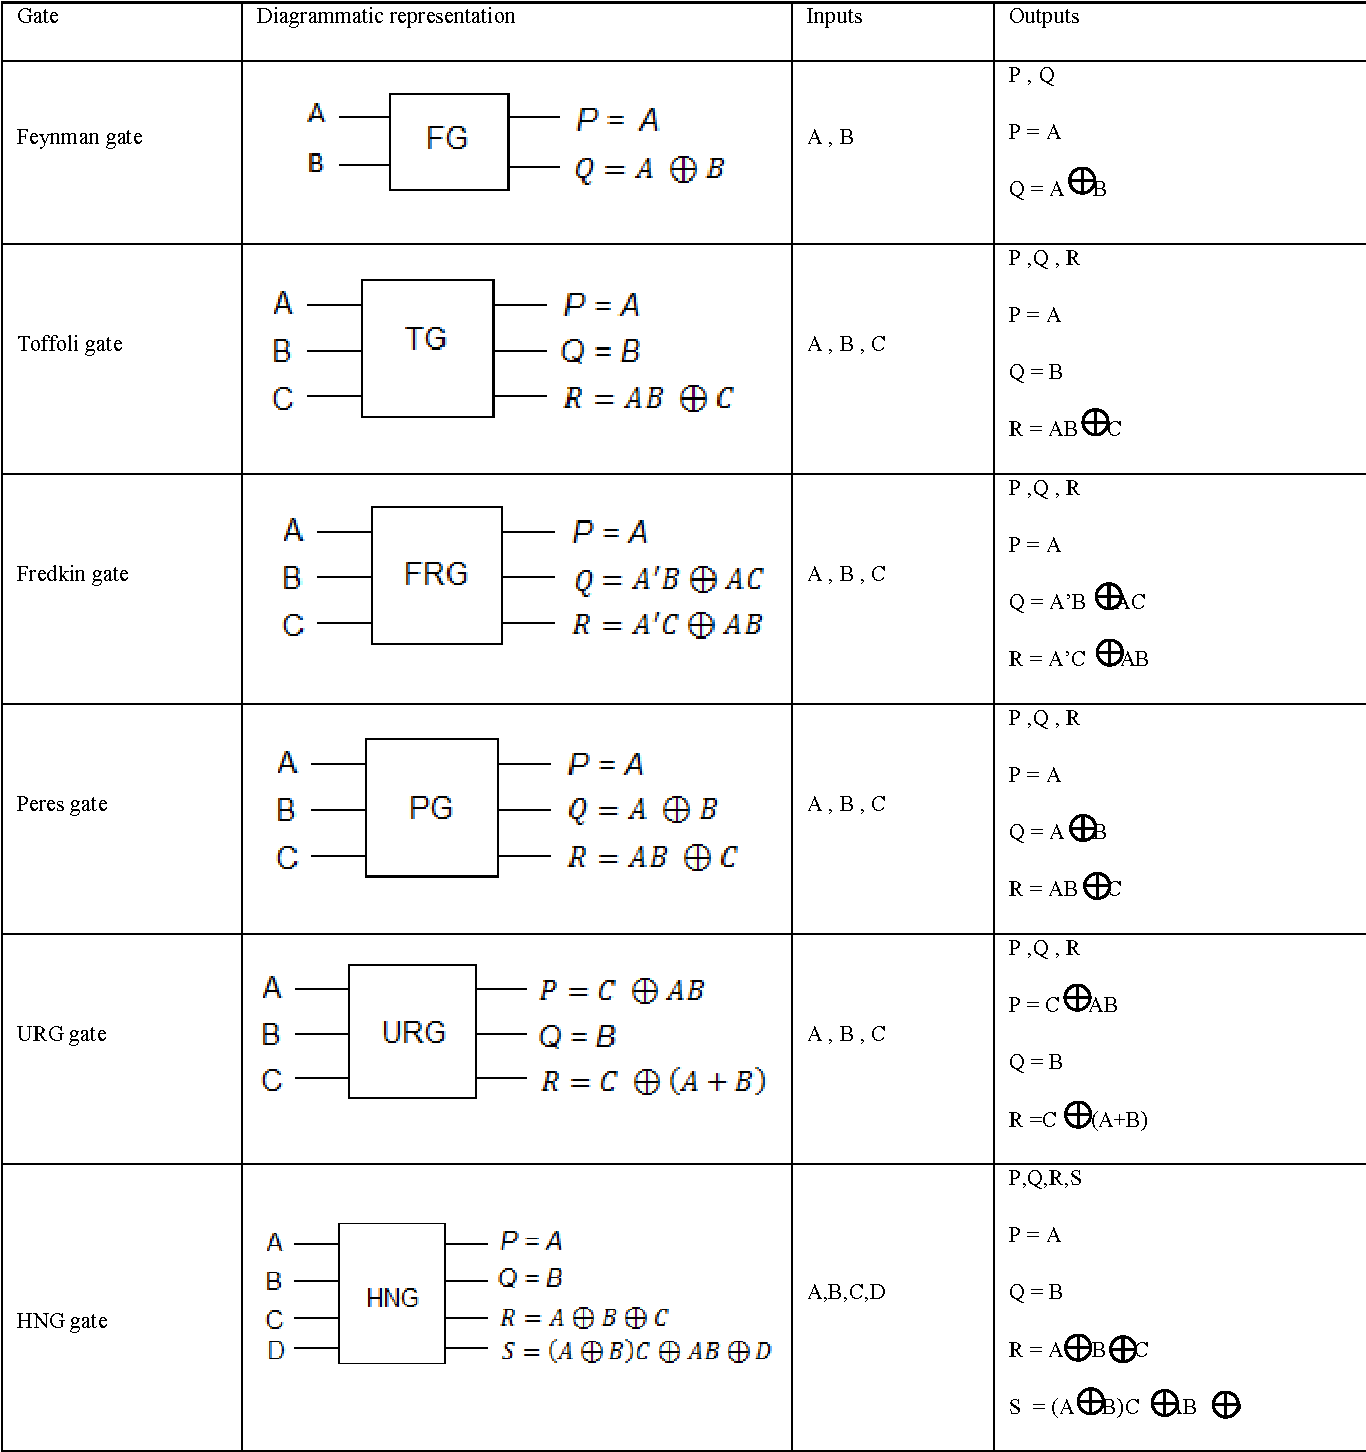 Energy Efficient Code Converters Using Reversible Logic Gates Bit Bcd Adder Public Circuit Online Simulator Semantic Scholar